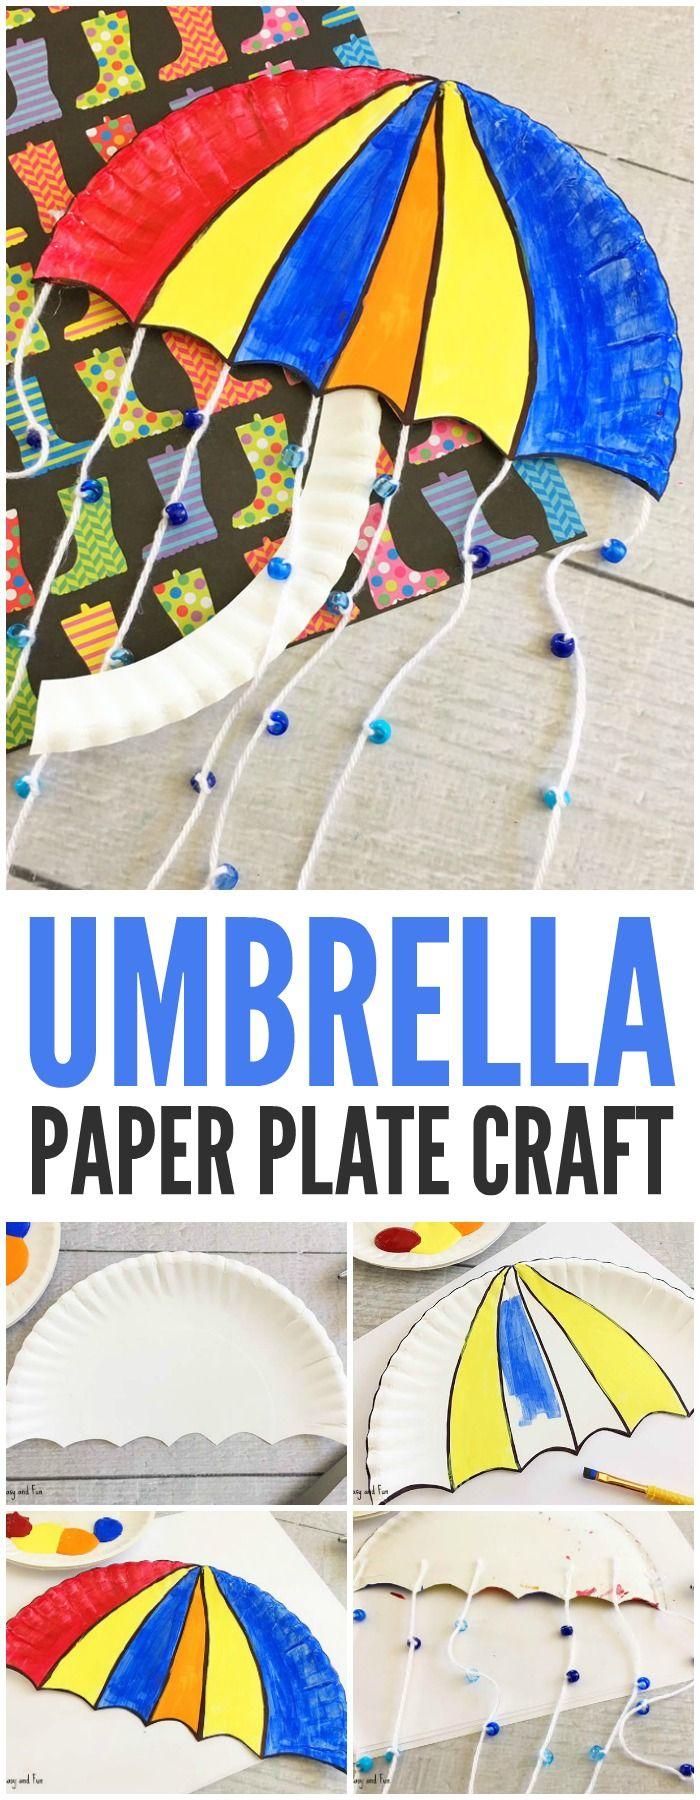 Cute Umbrella Paper Plate Craft for Kids to Make